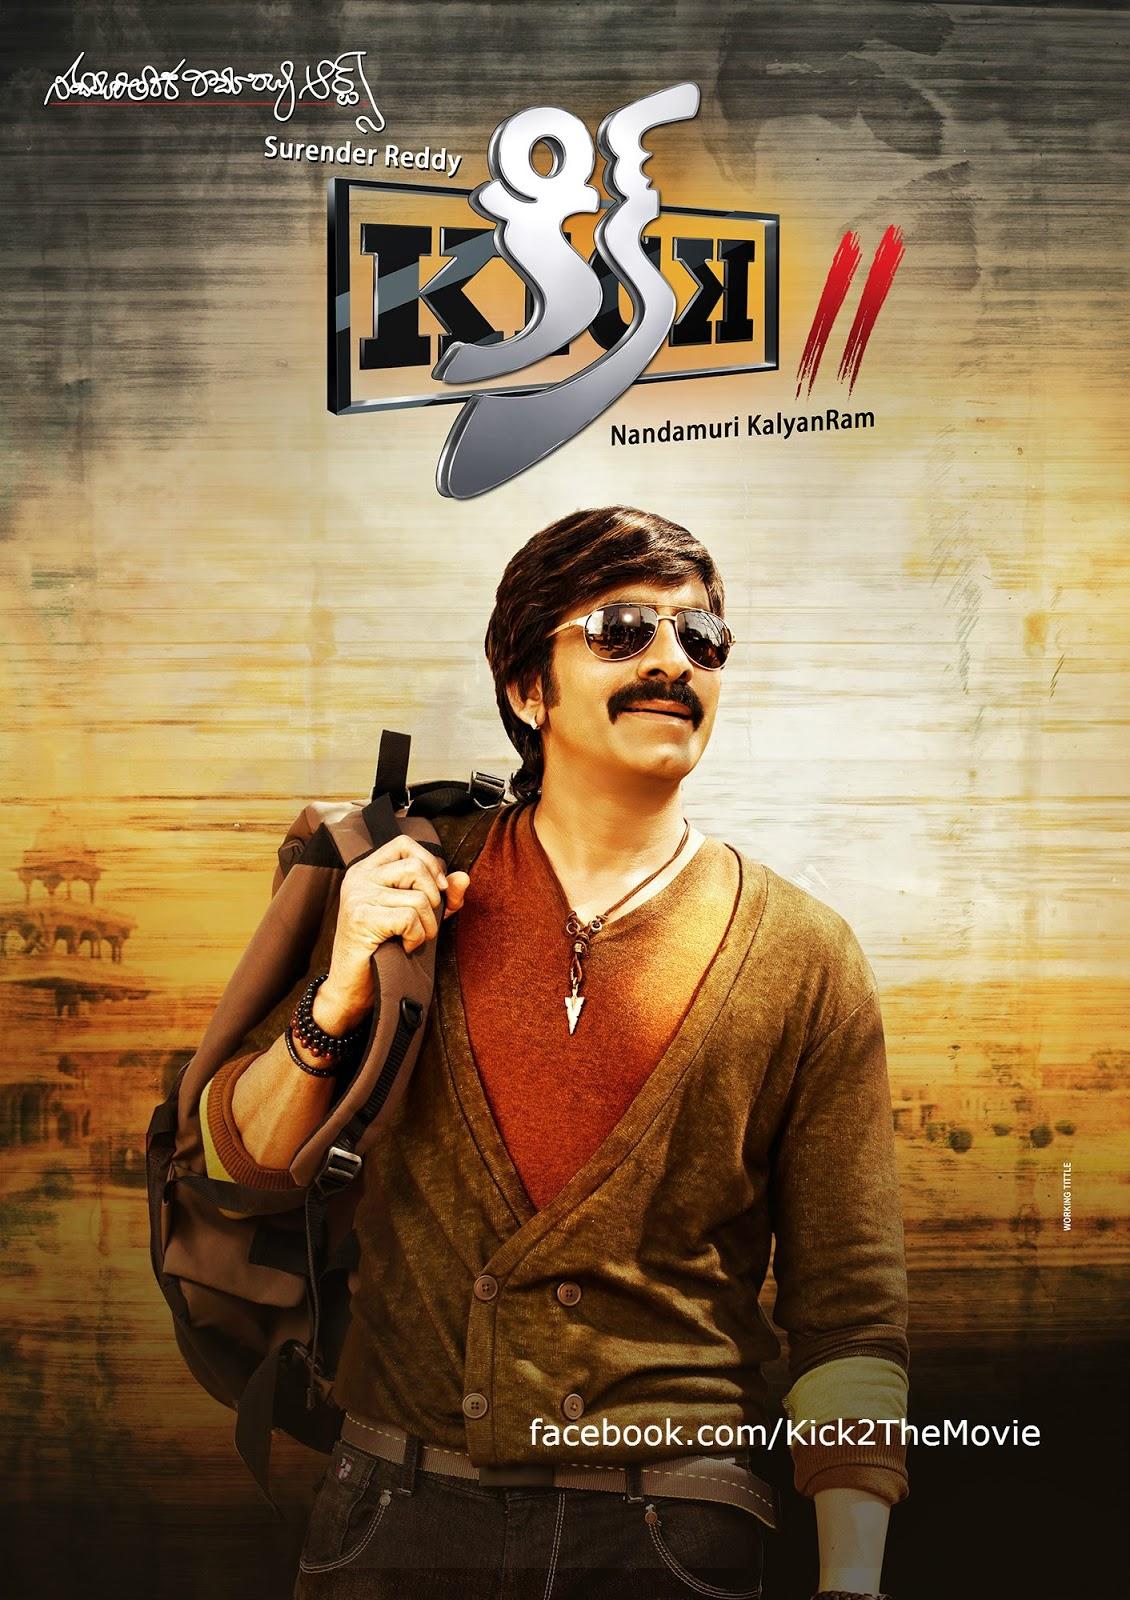 Ravi Kishan 2015 Upcoming movie Kick 2 release date image, poster